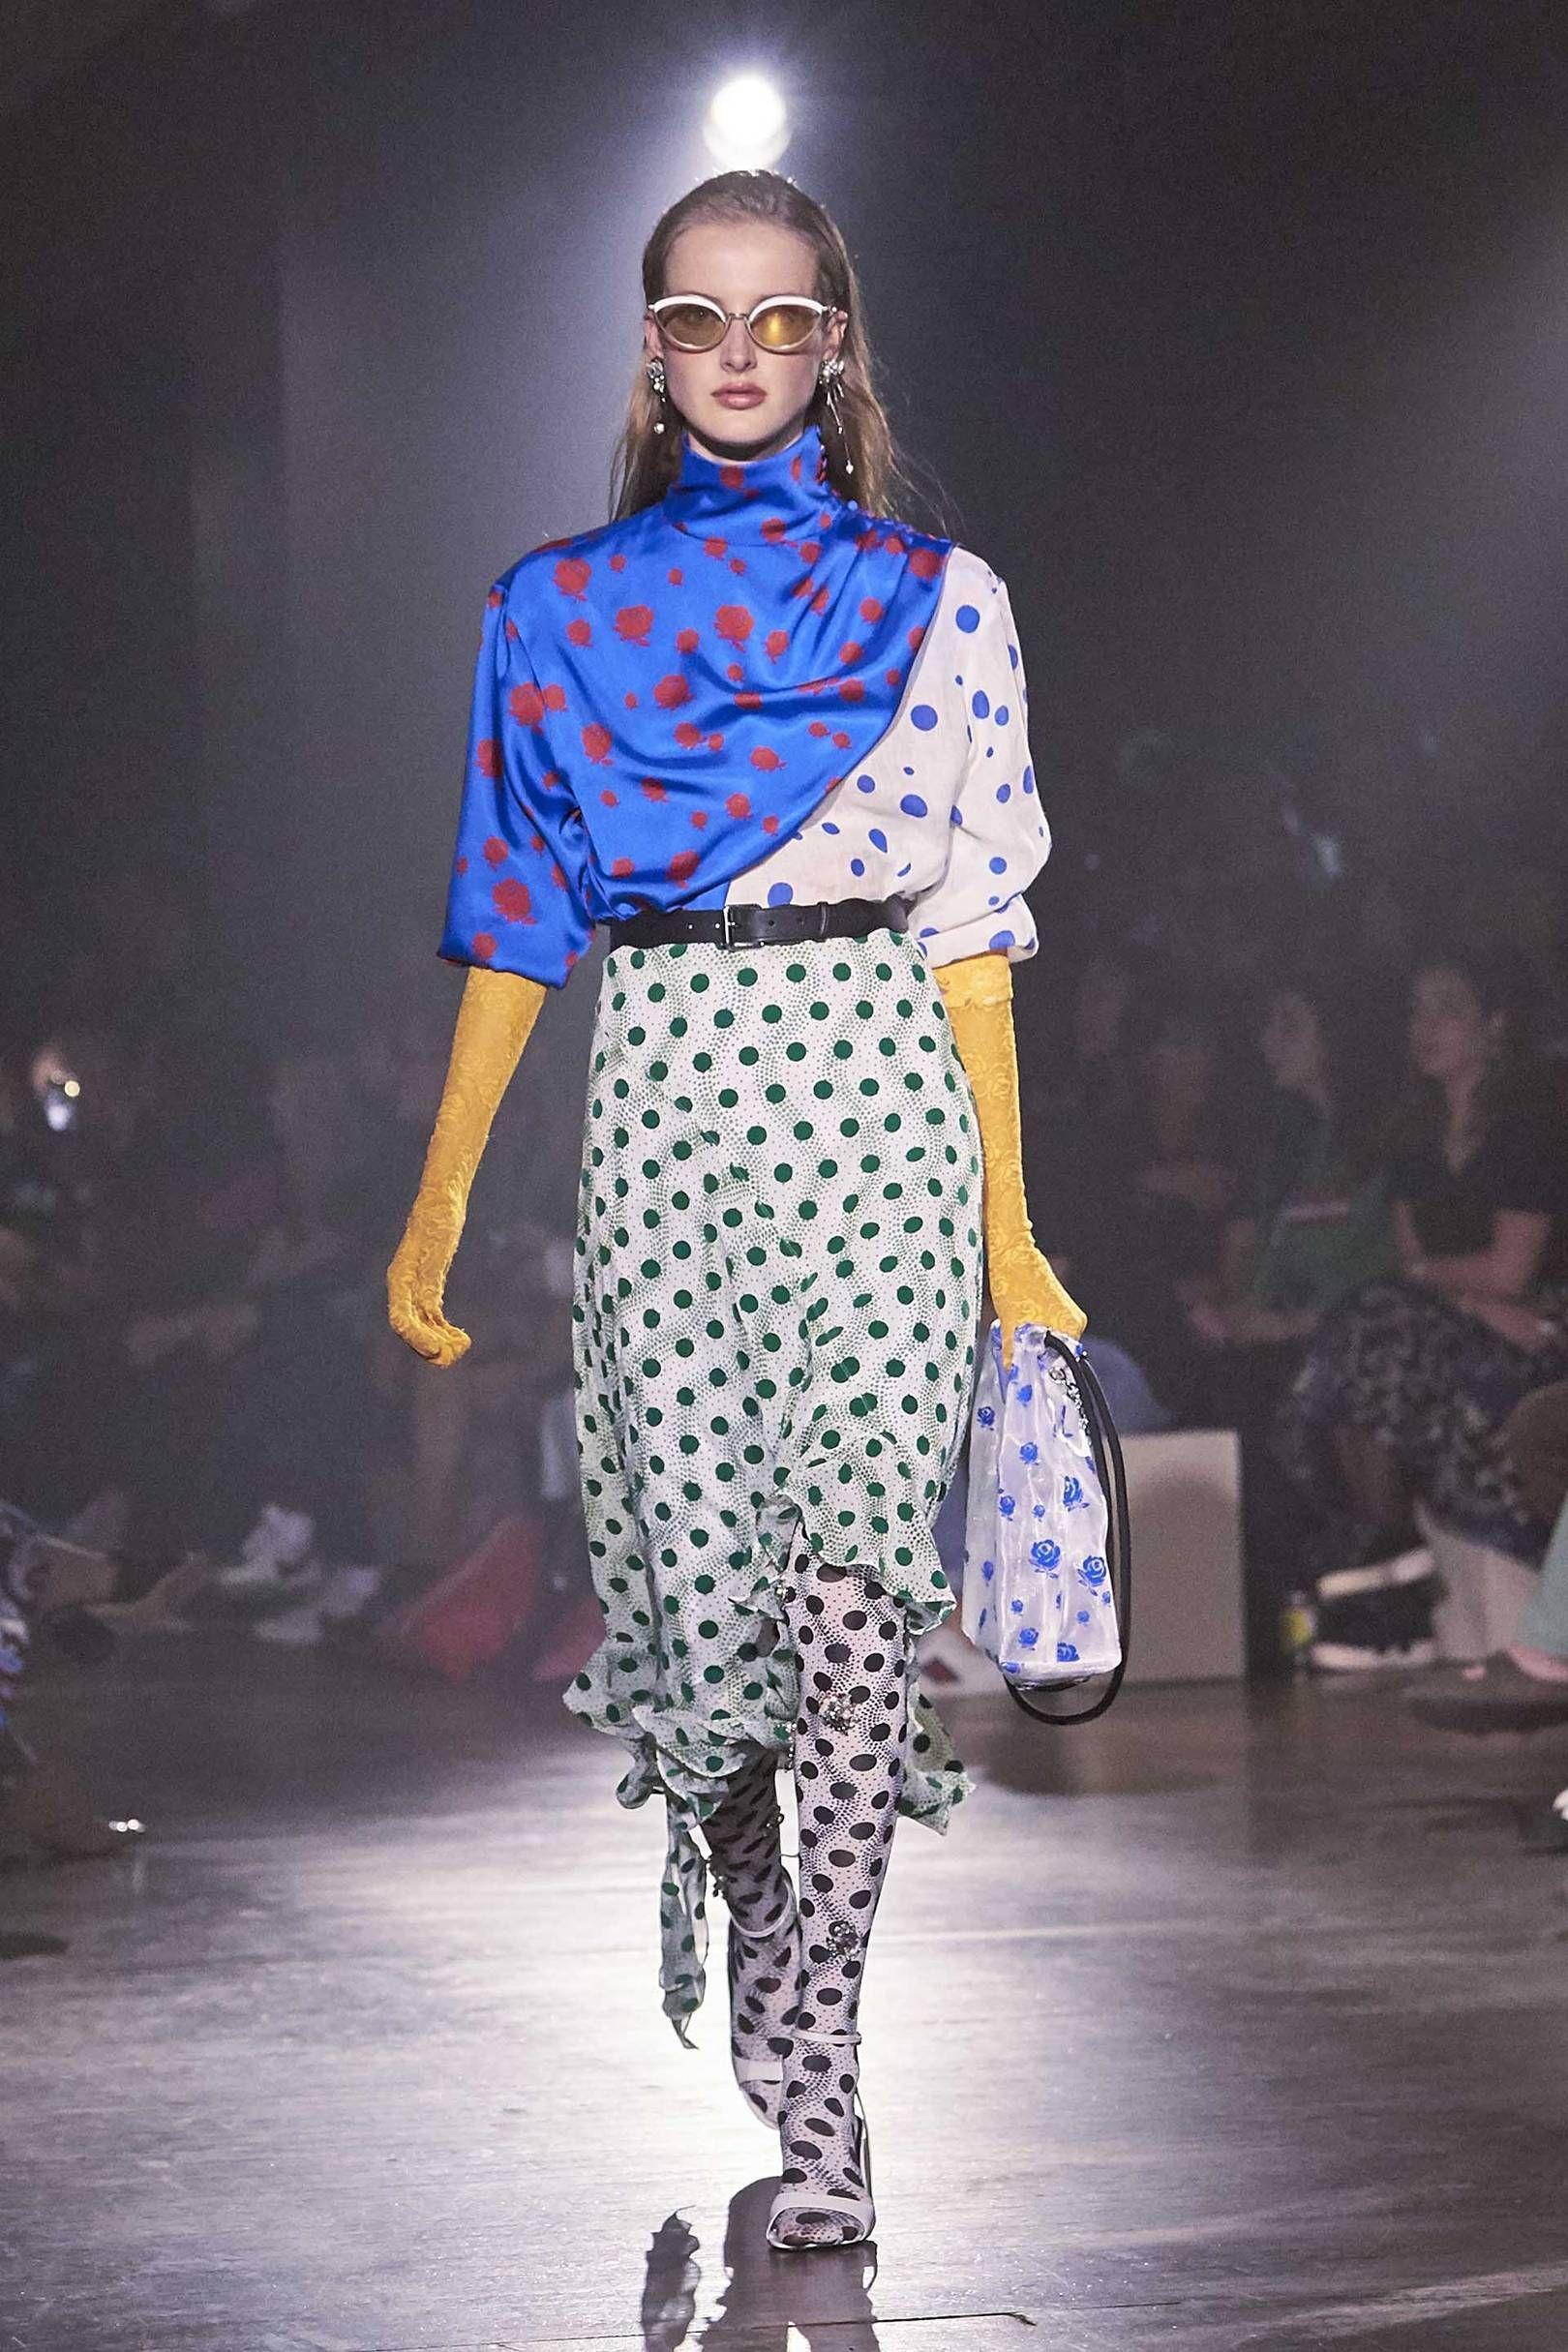 ab63b8d6 Kenzo Spring/Summer 2019 Menswear   ss19   Kenzo, Spring summer, Fashion